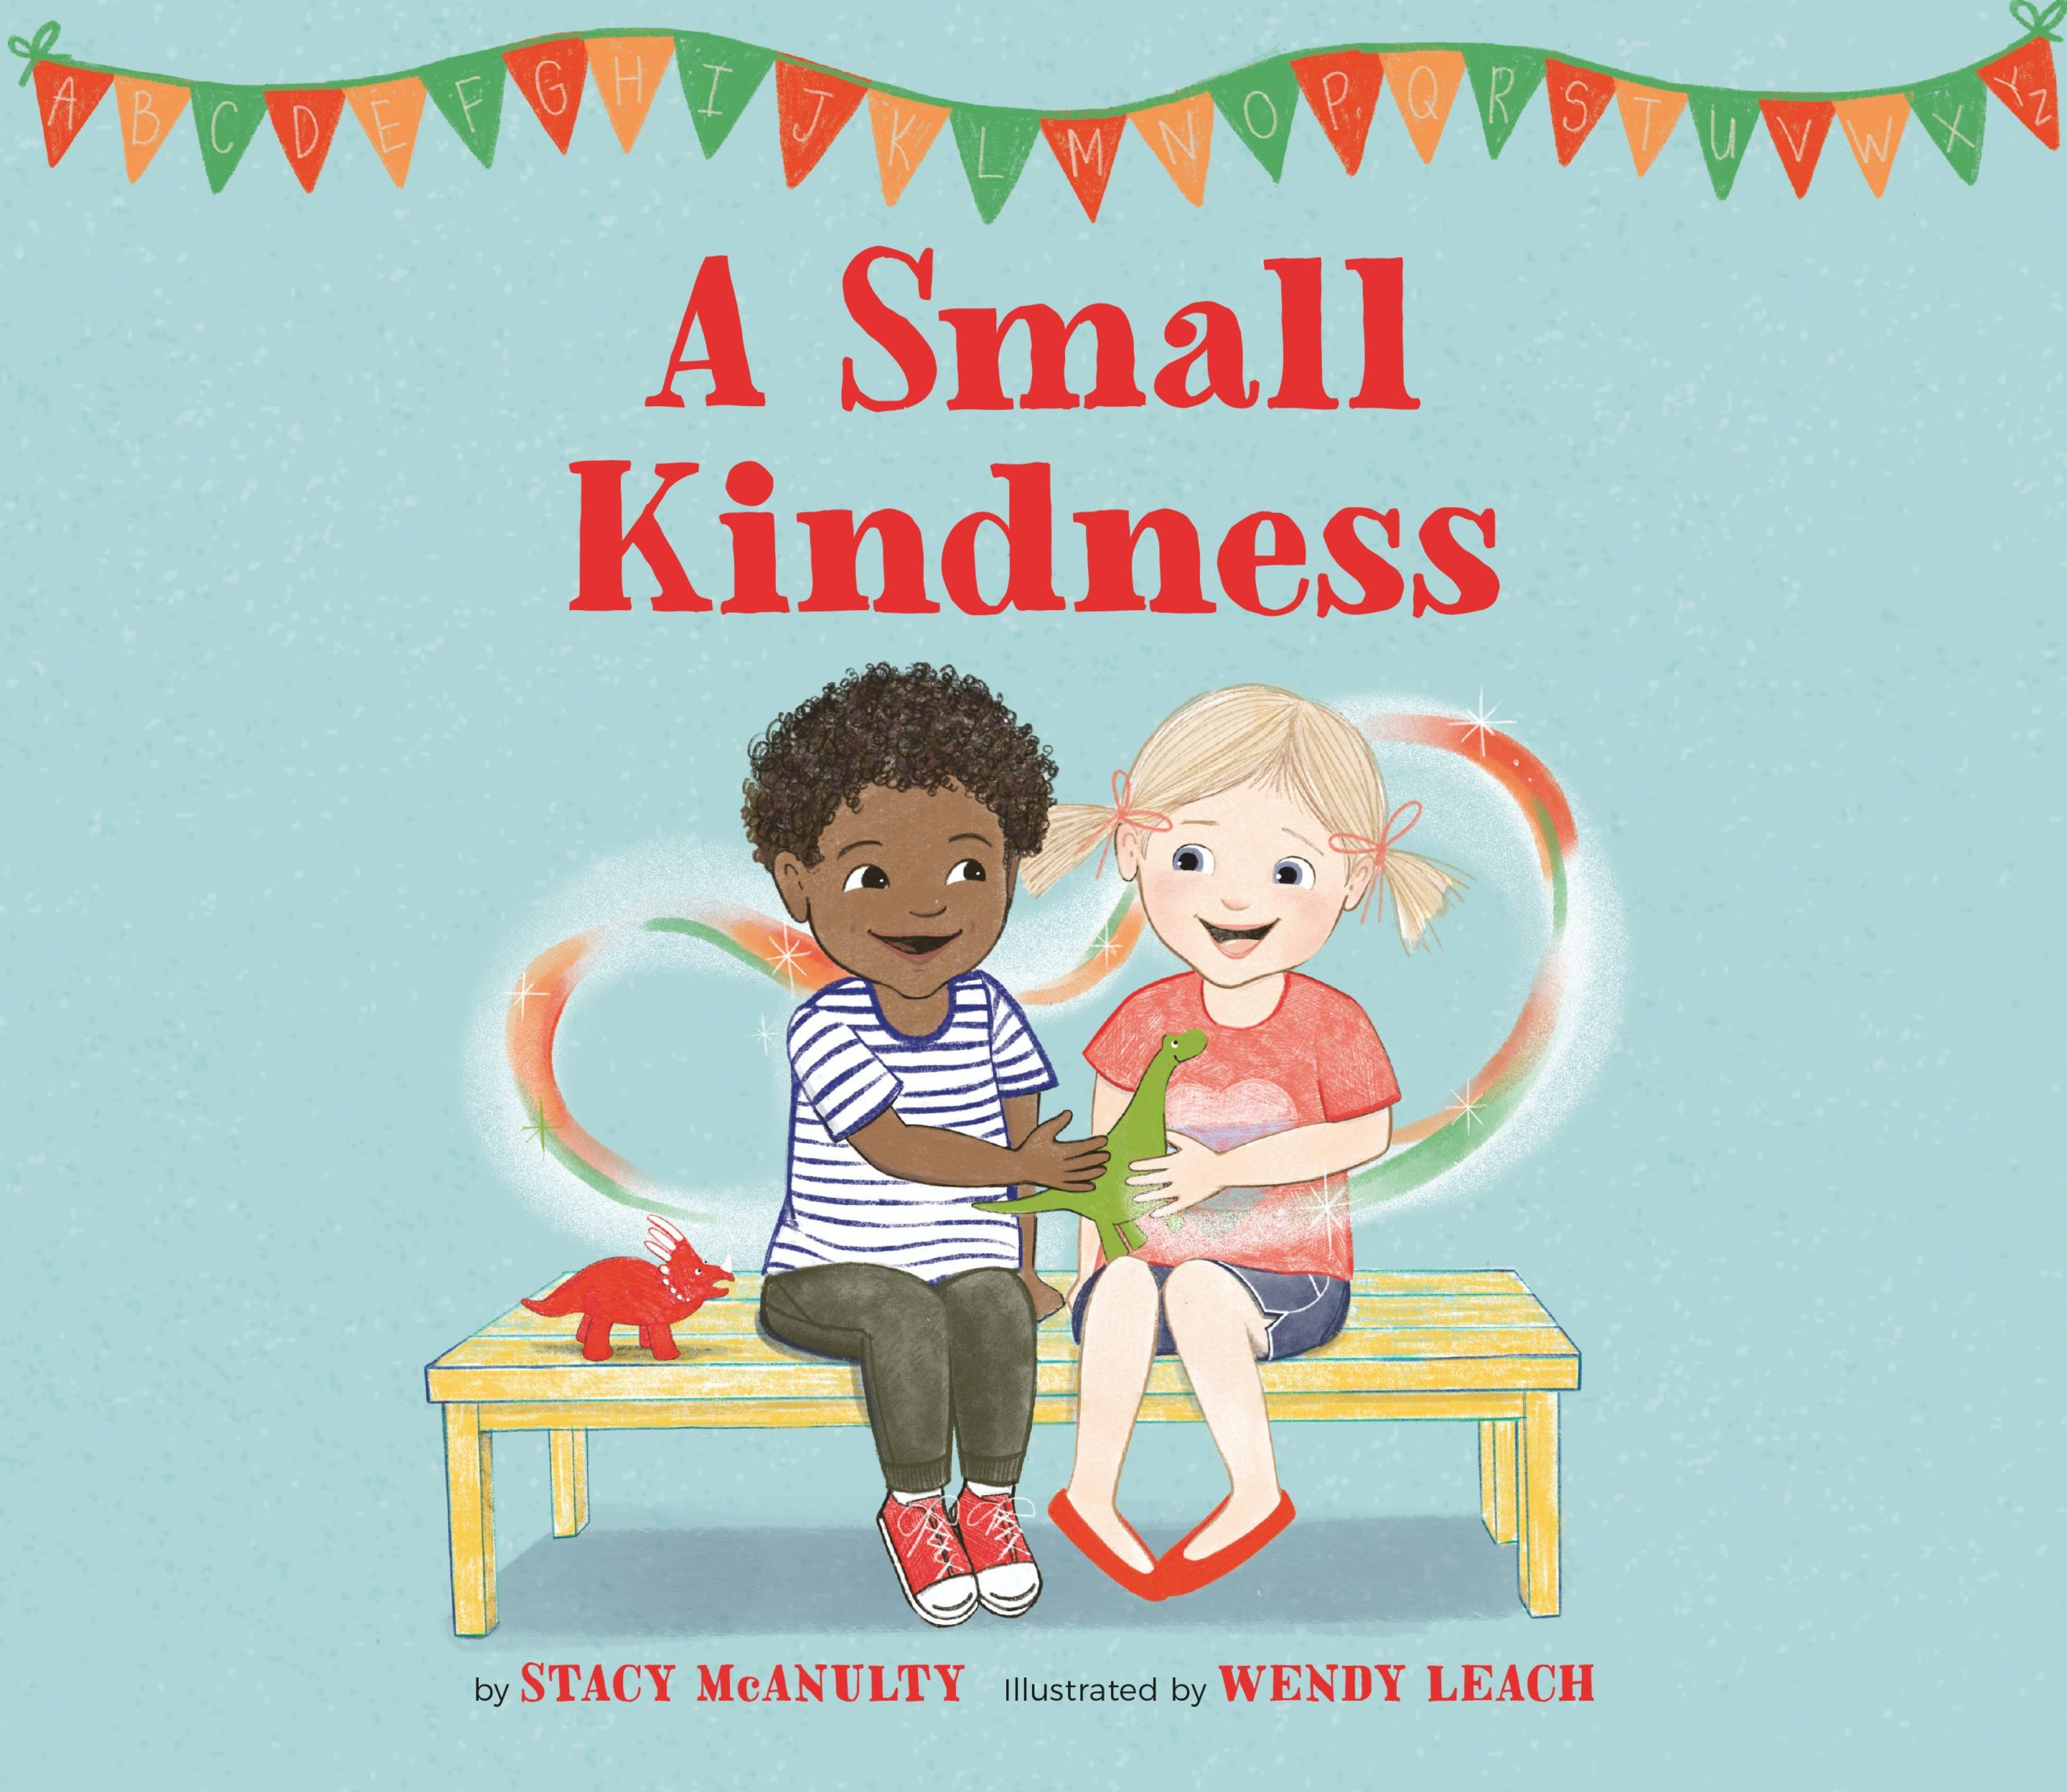 A Small Kindness